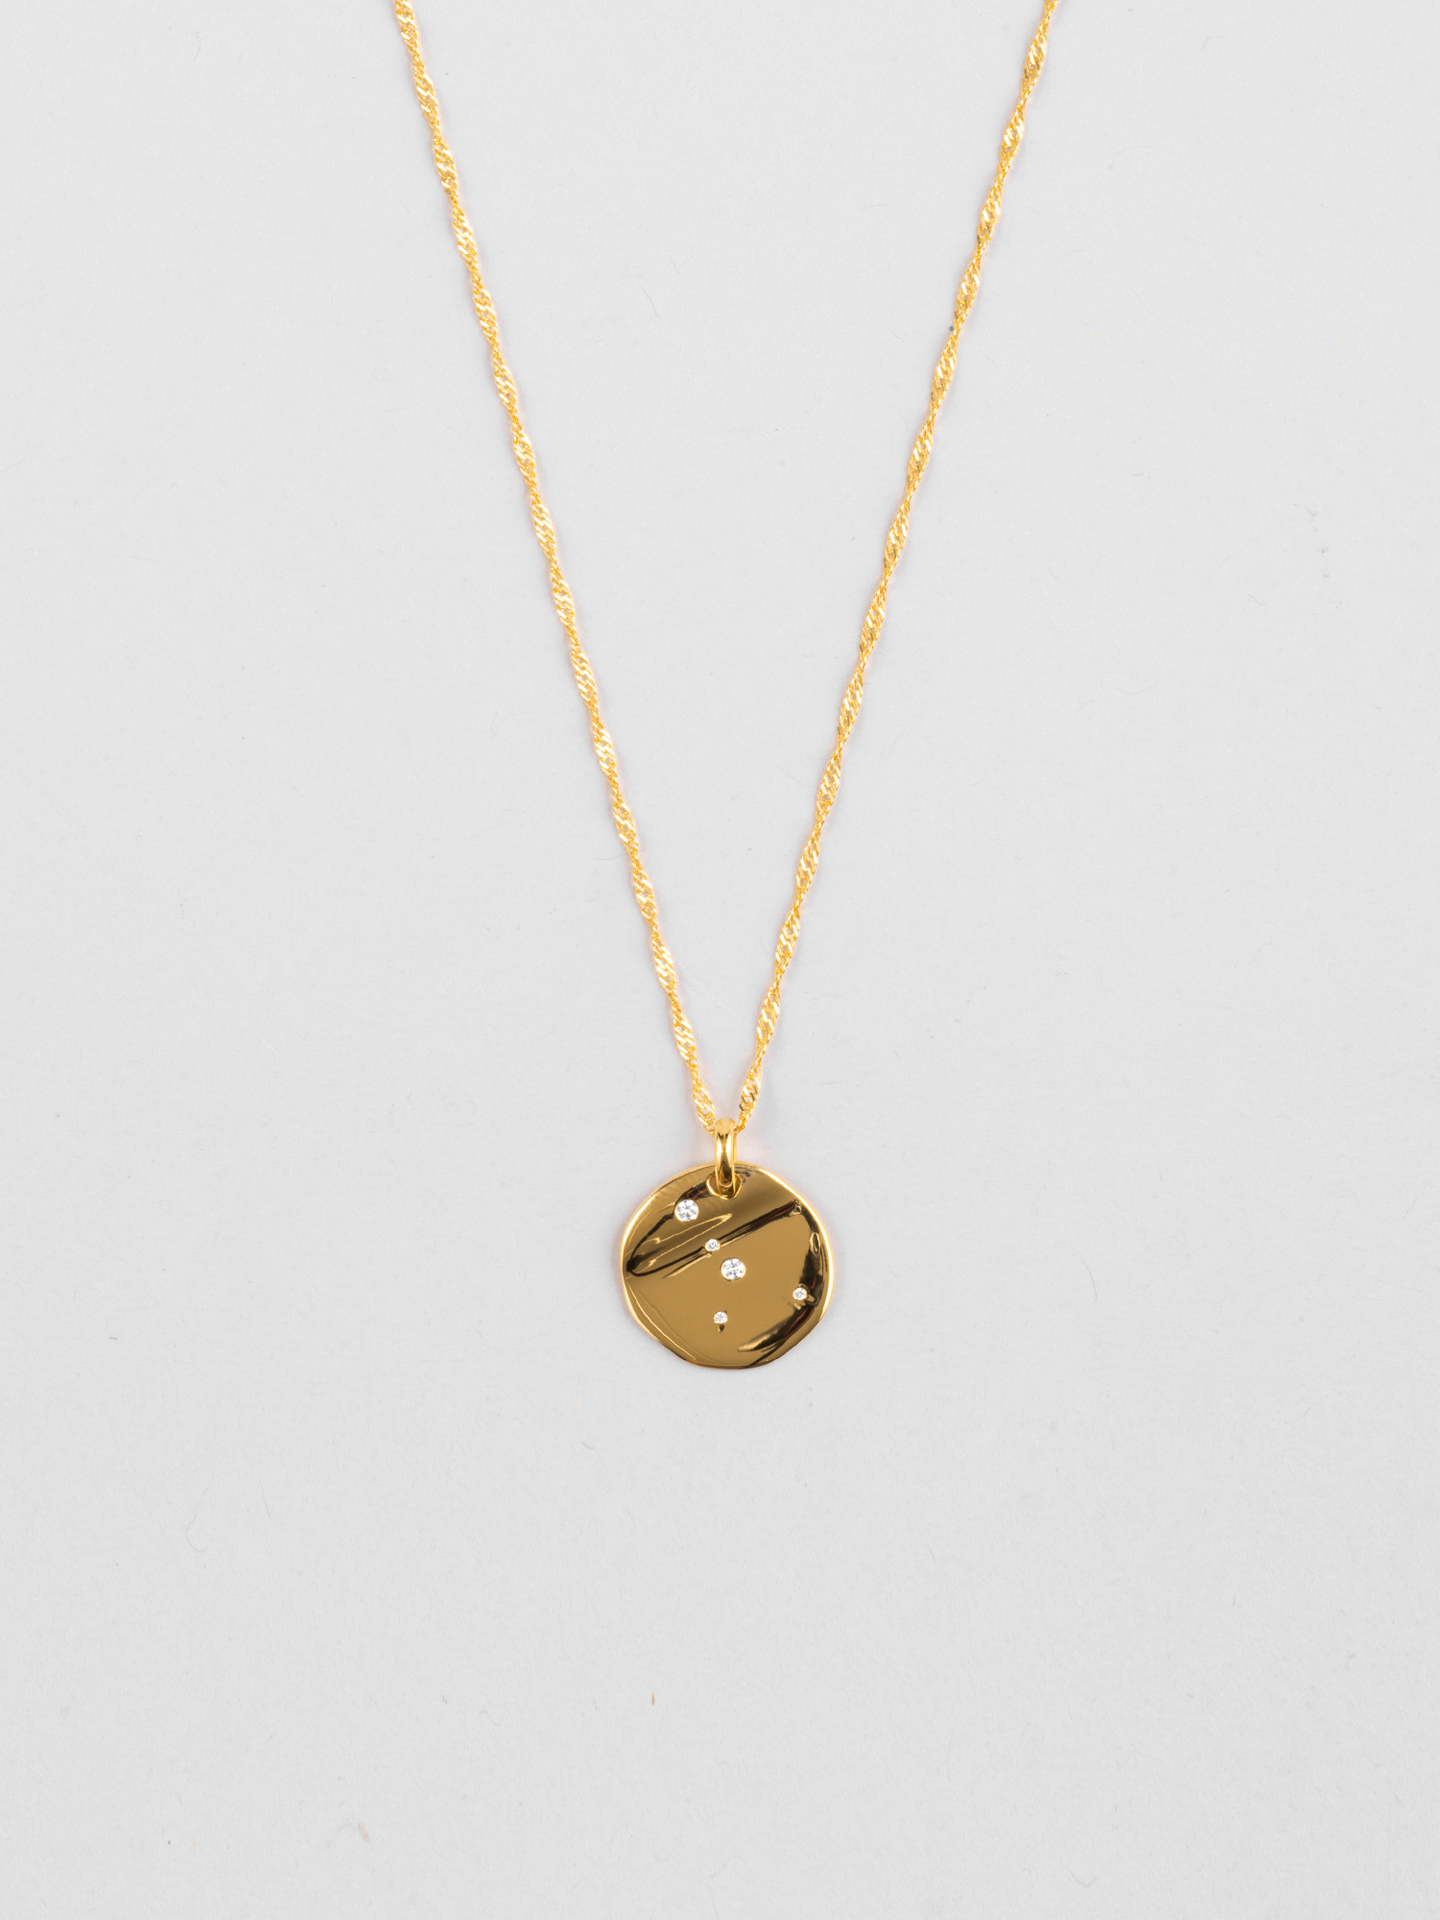 Cancer Zodiac Disc Necklace